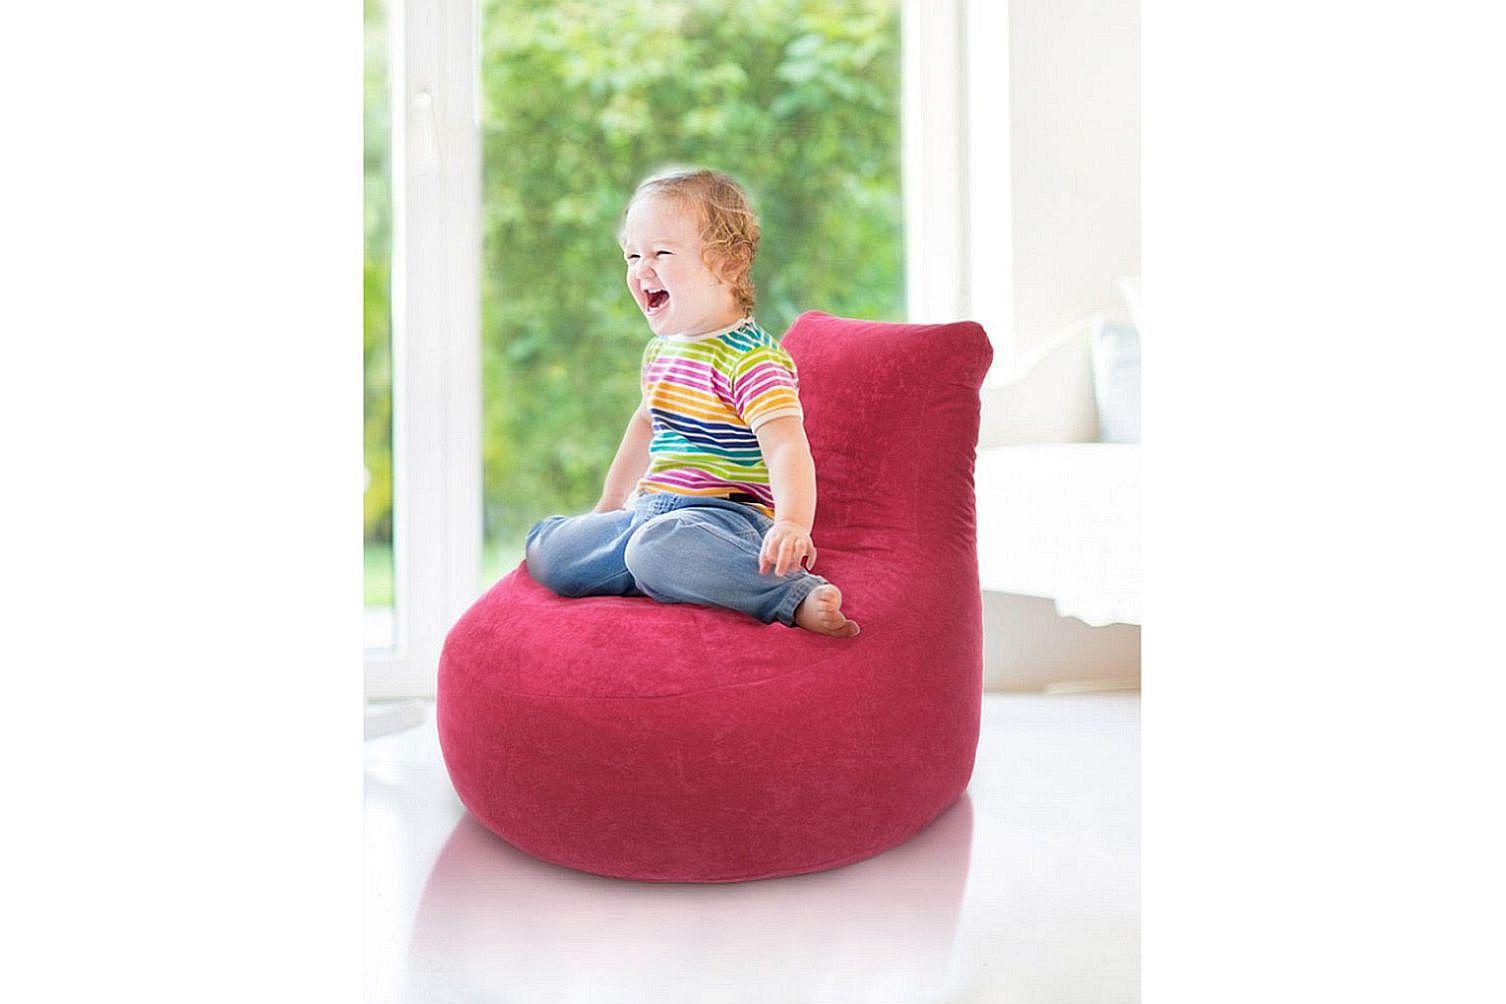 kinder sitzkissen bodenkissen kissen neu sitzsack sitzsaecke sitzs cke sessel ebay. Black Bedroom Furniture Sets. Home Design Ideas